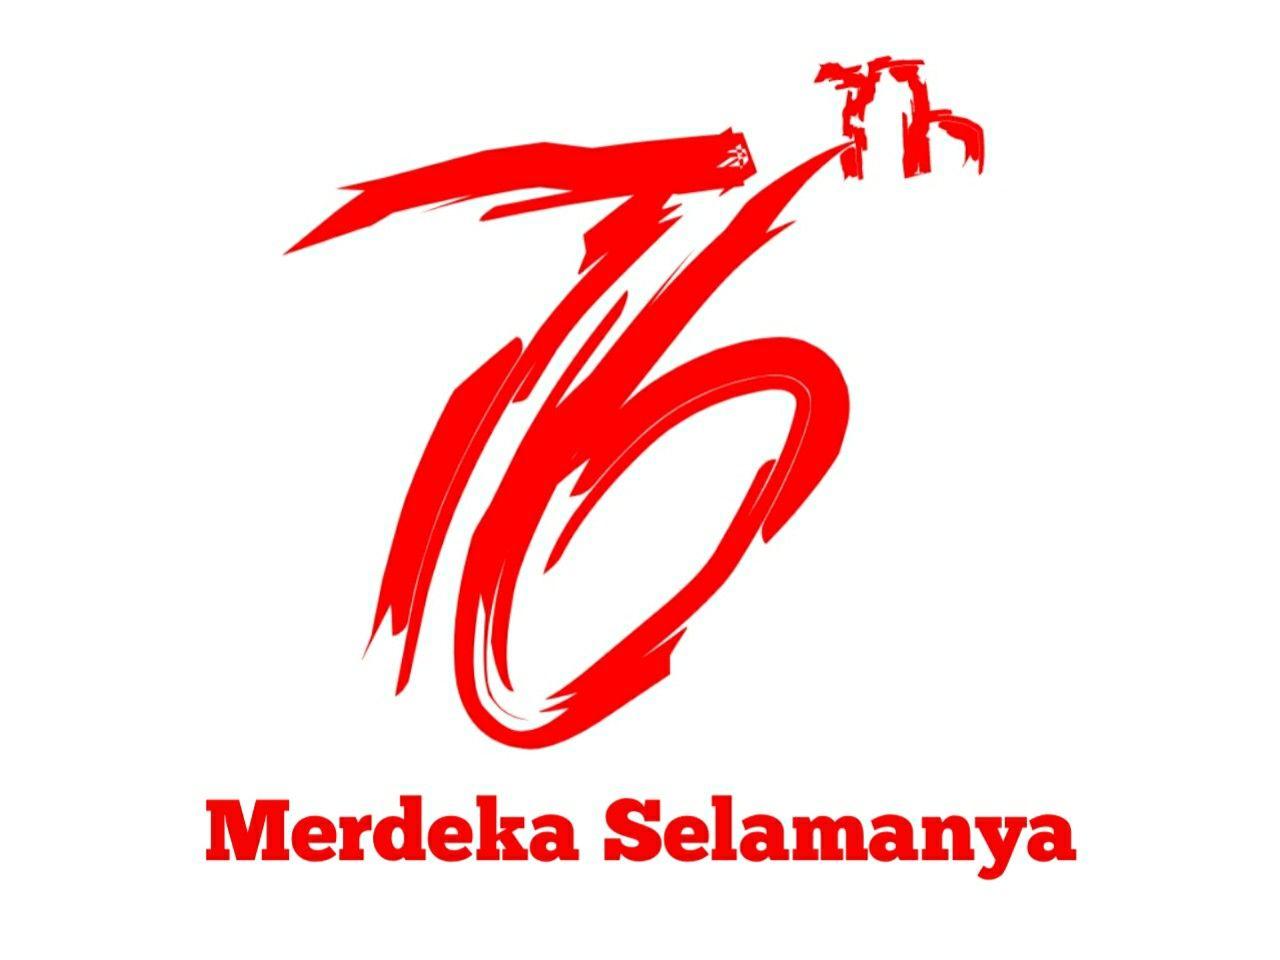 Konsep Logo Kemerdekaan Indonesia 76 Tahun By Me Gambar Sahabat